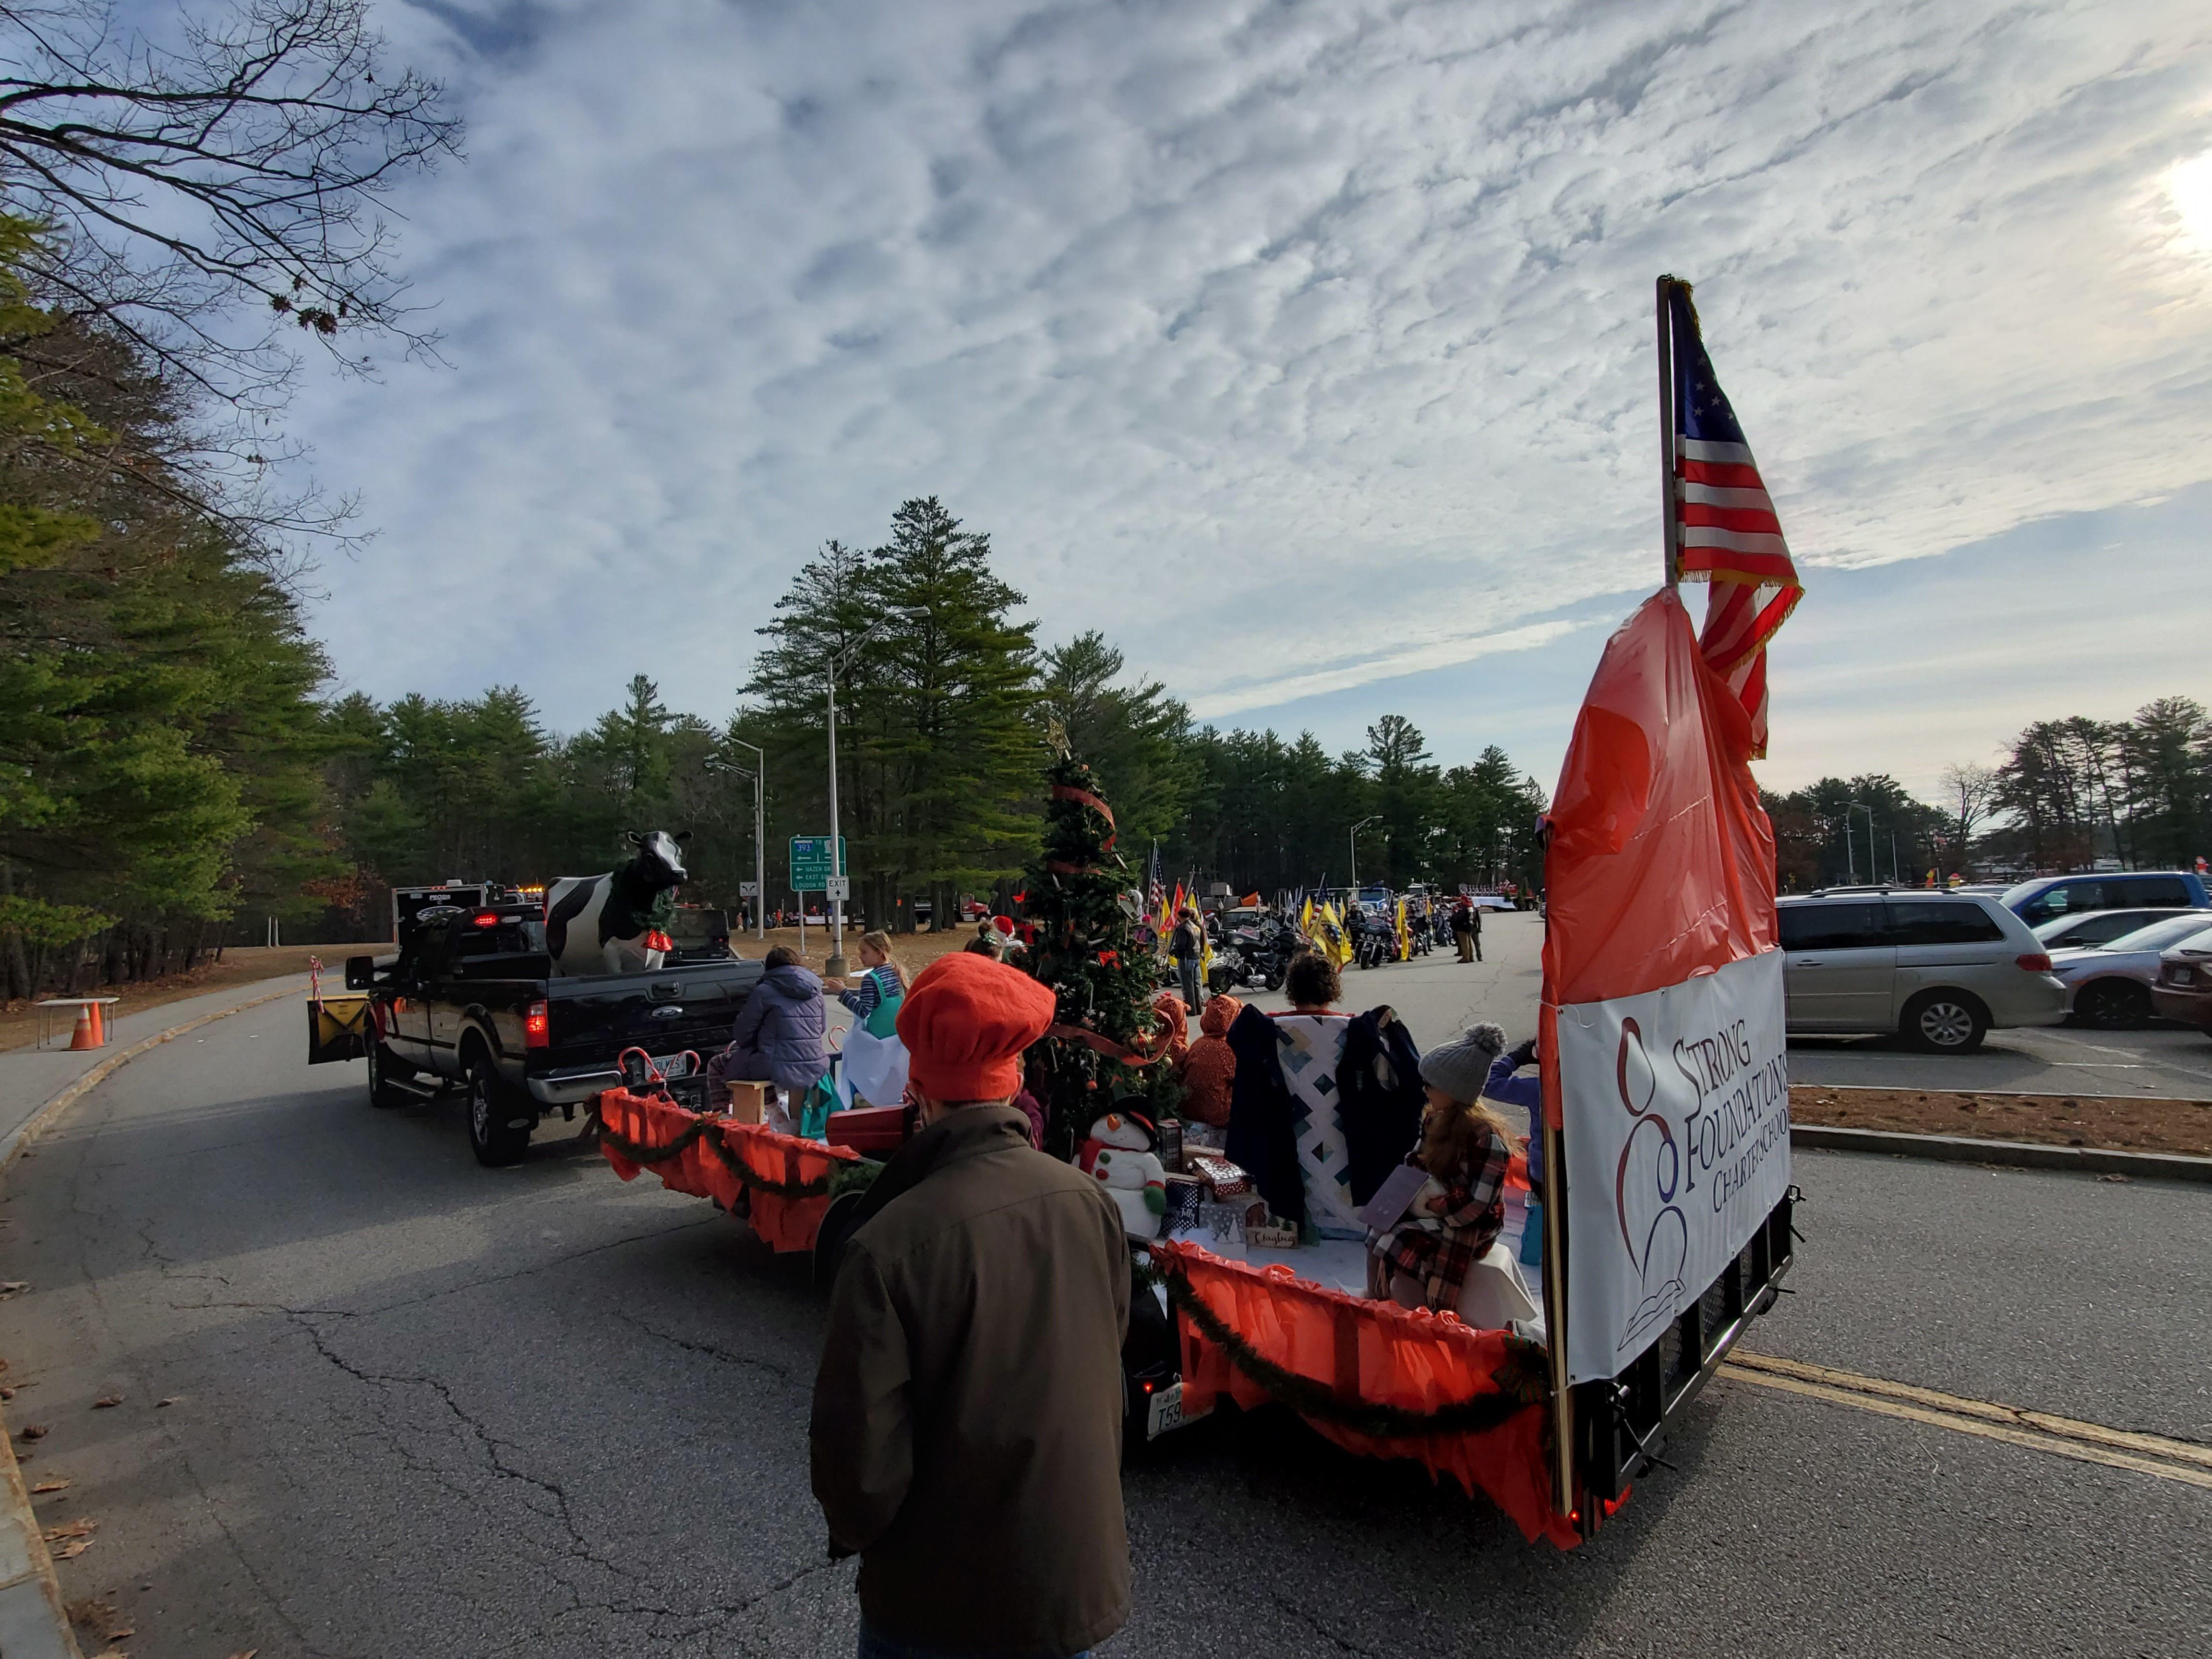 The Concord Christmas Parade